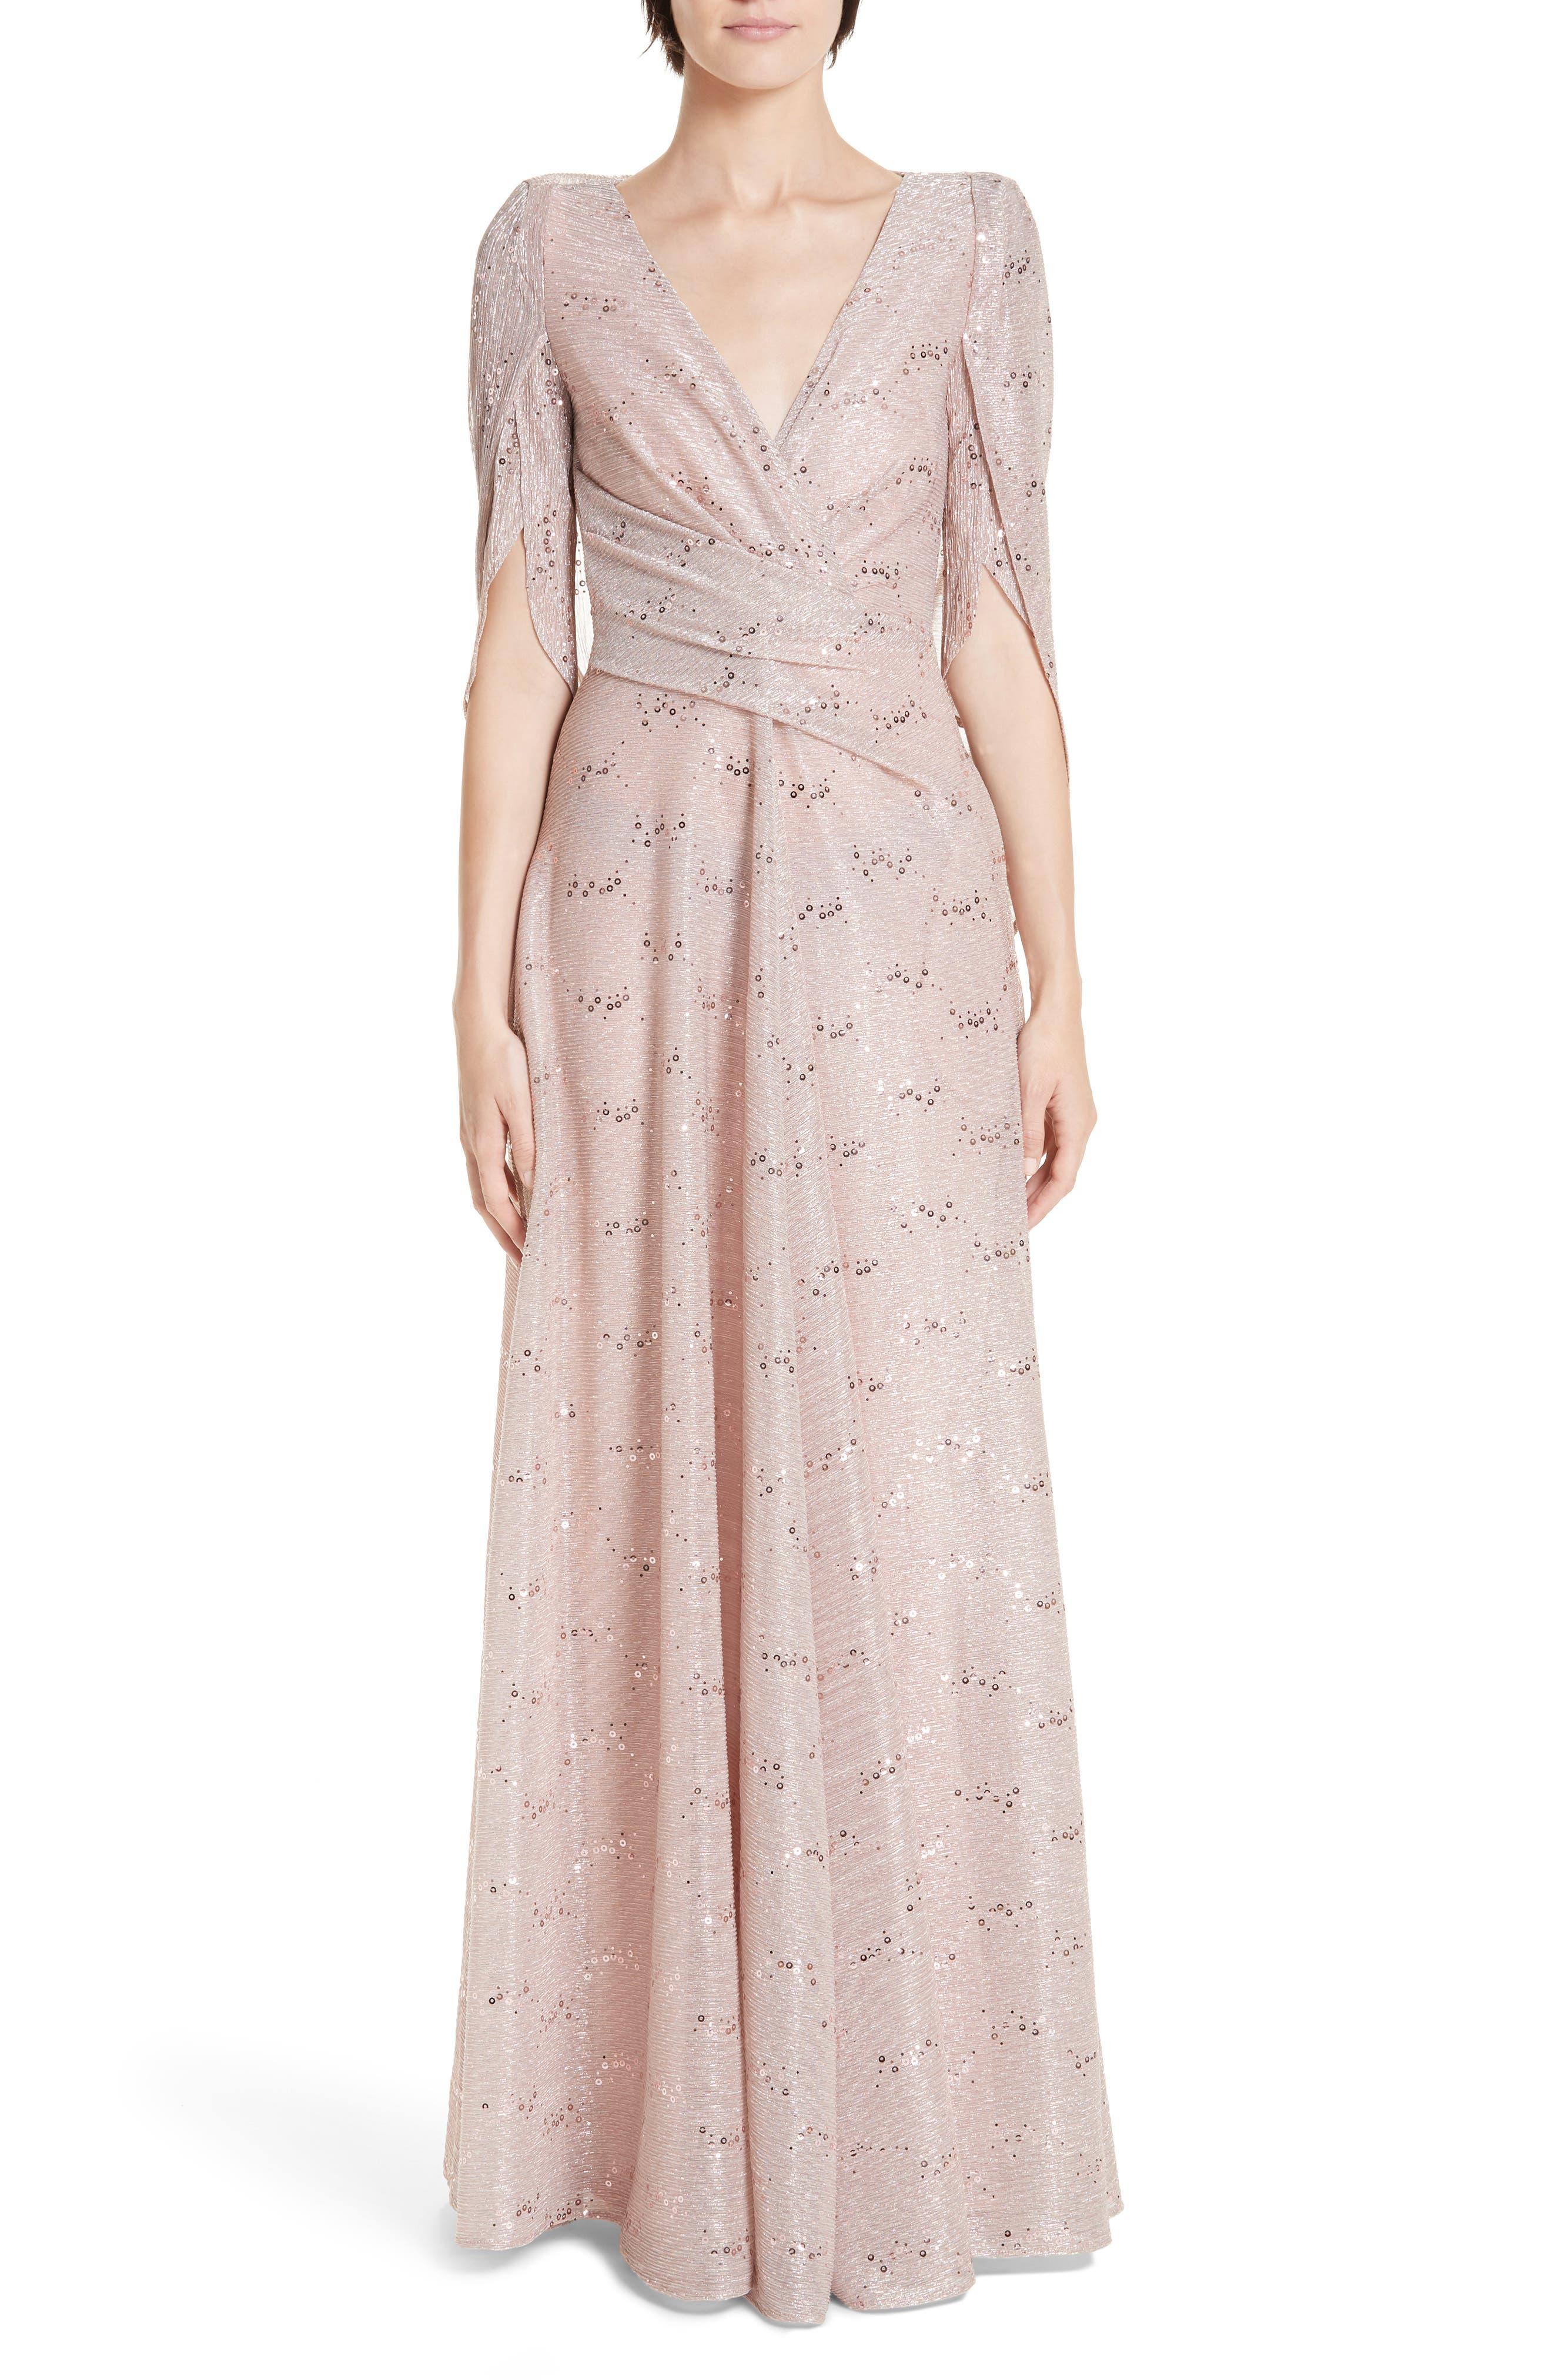 Talbot Runhof Sequin Metallic Voile Drape Back Gown, Pink